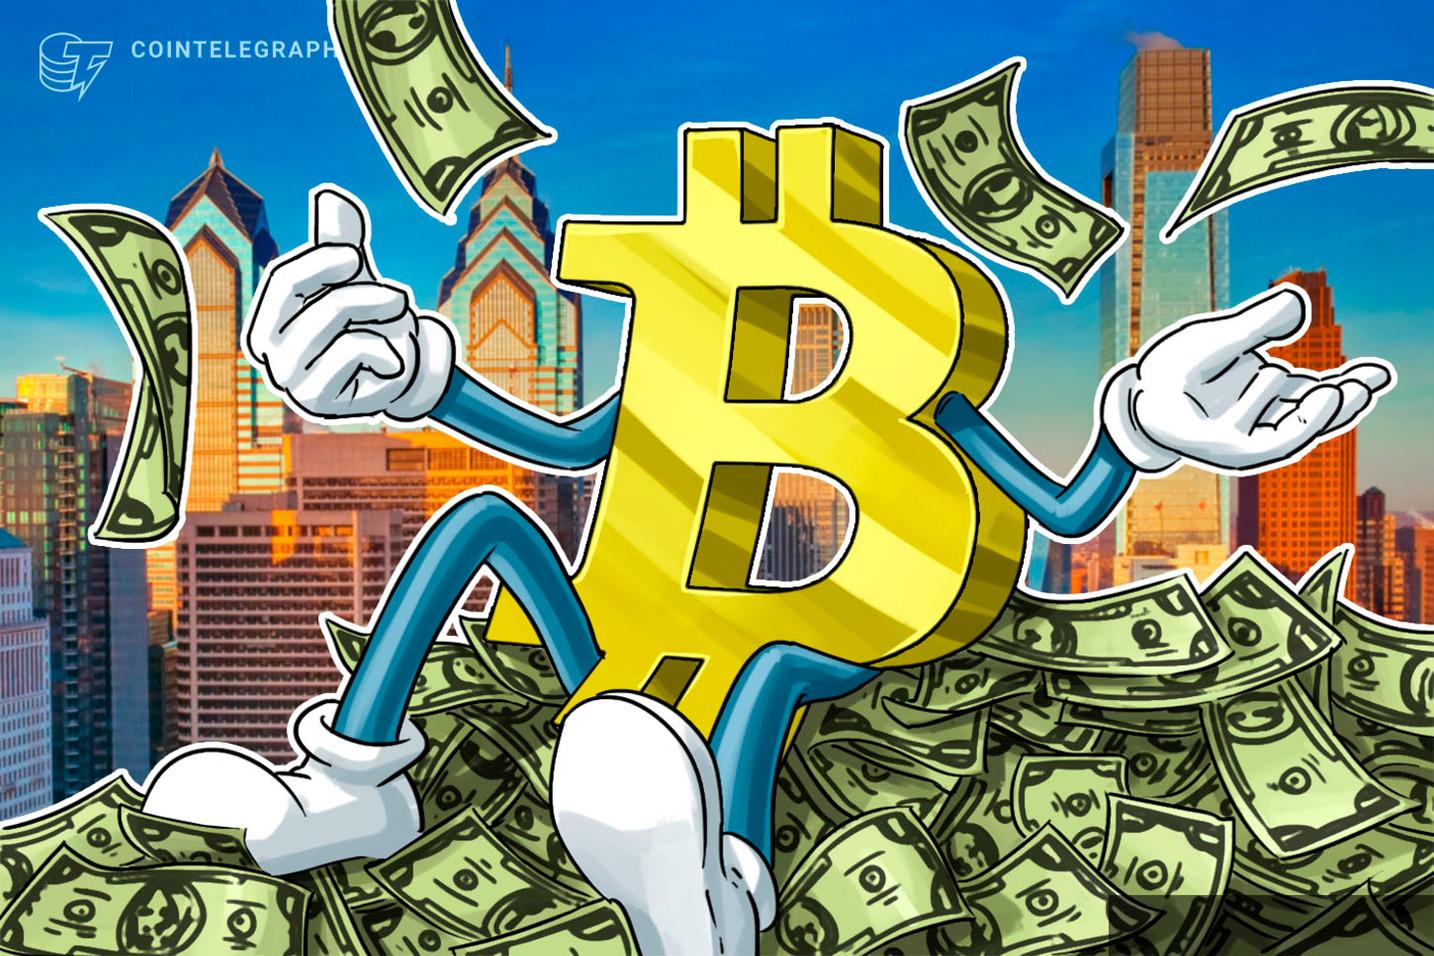 Acerca de la verdadera naturaleza del dinero